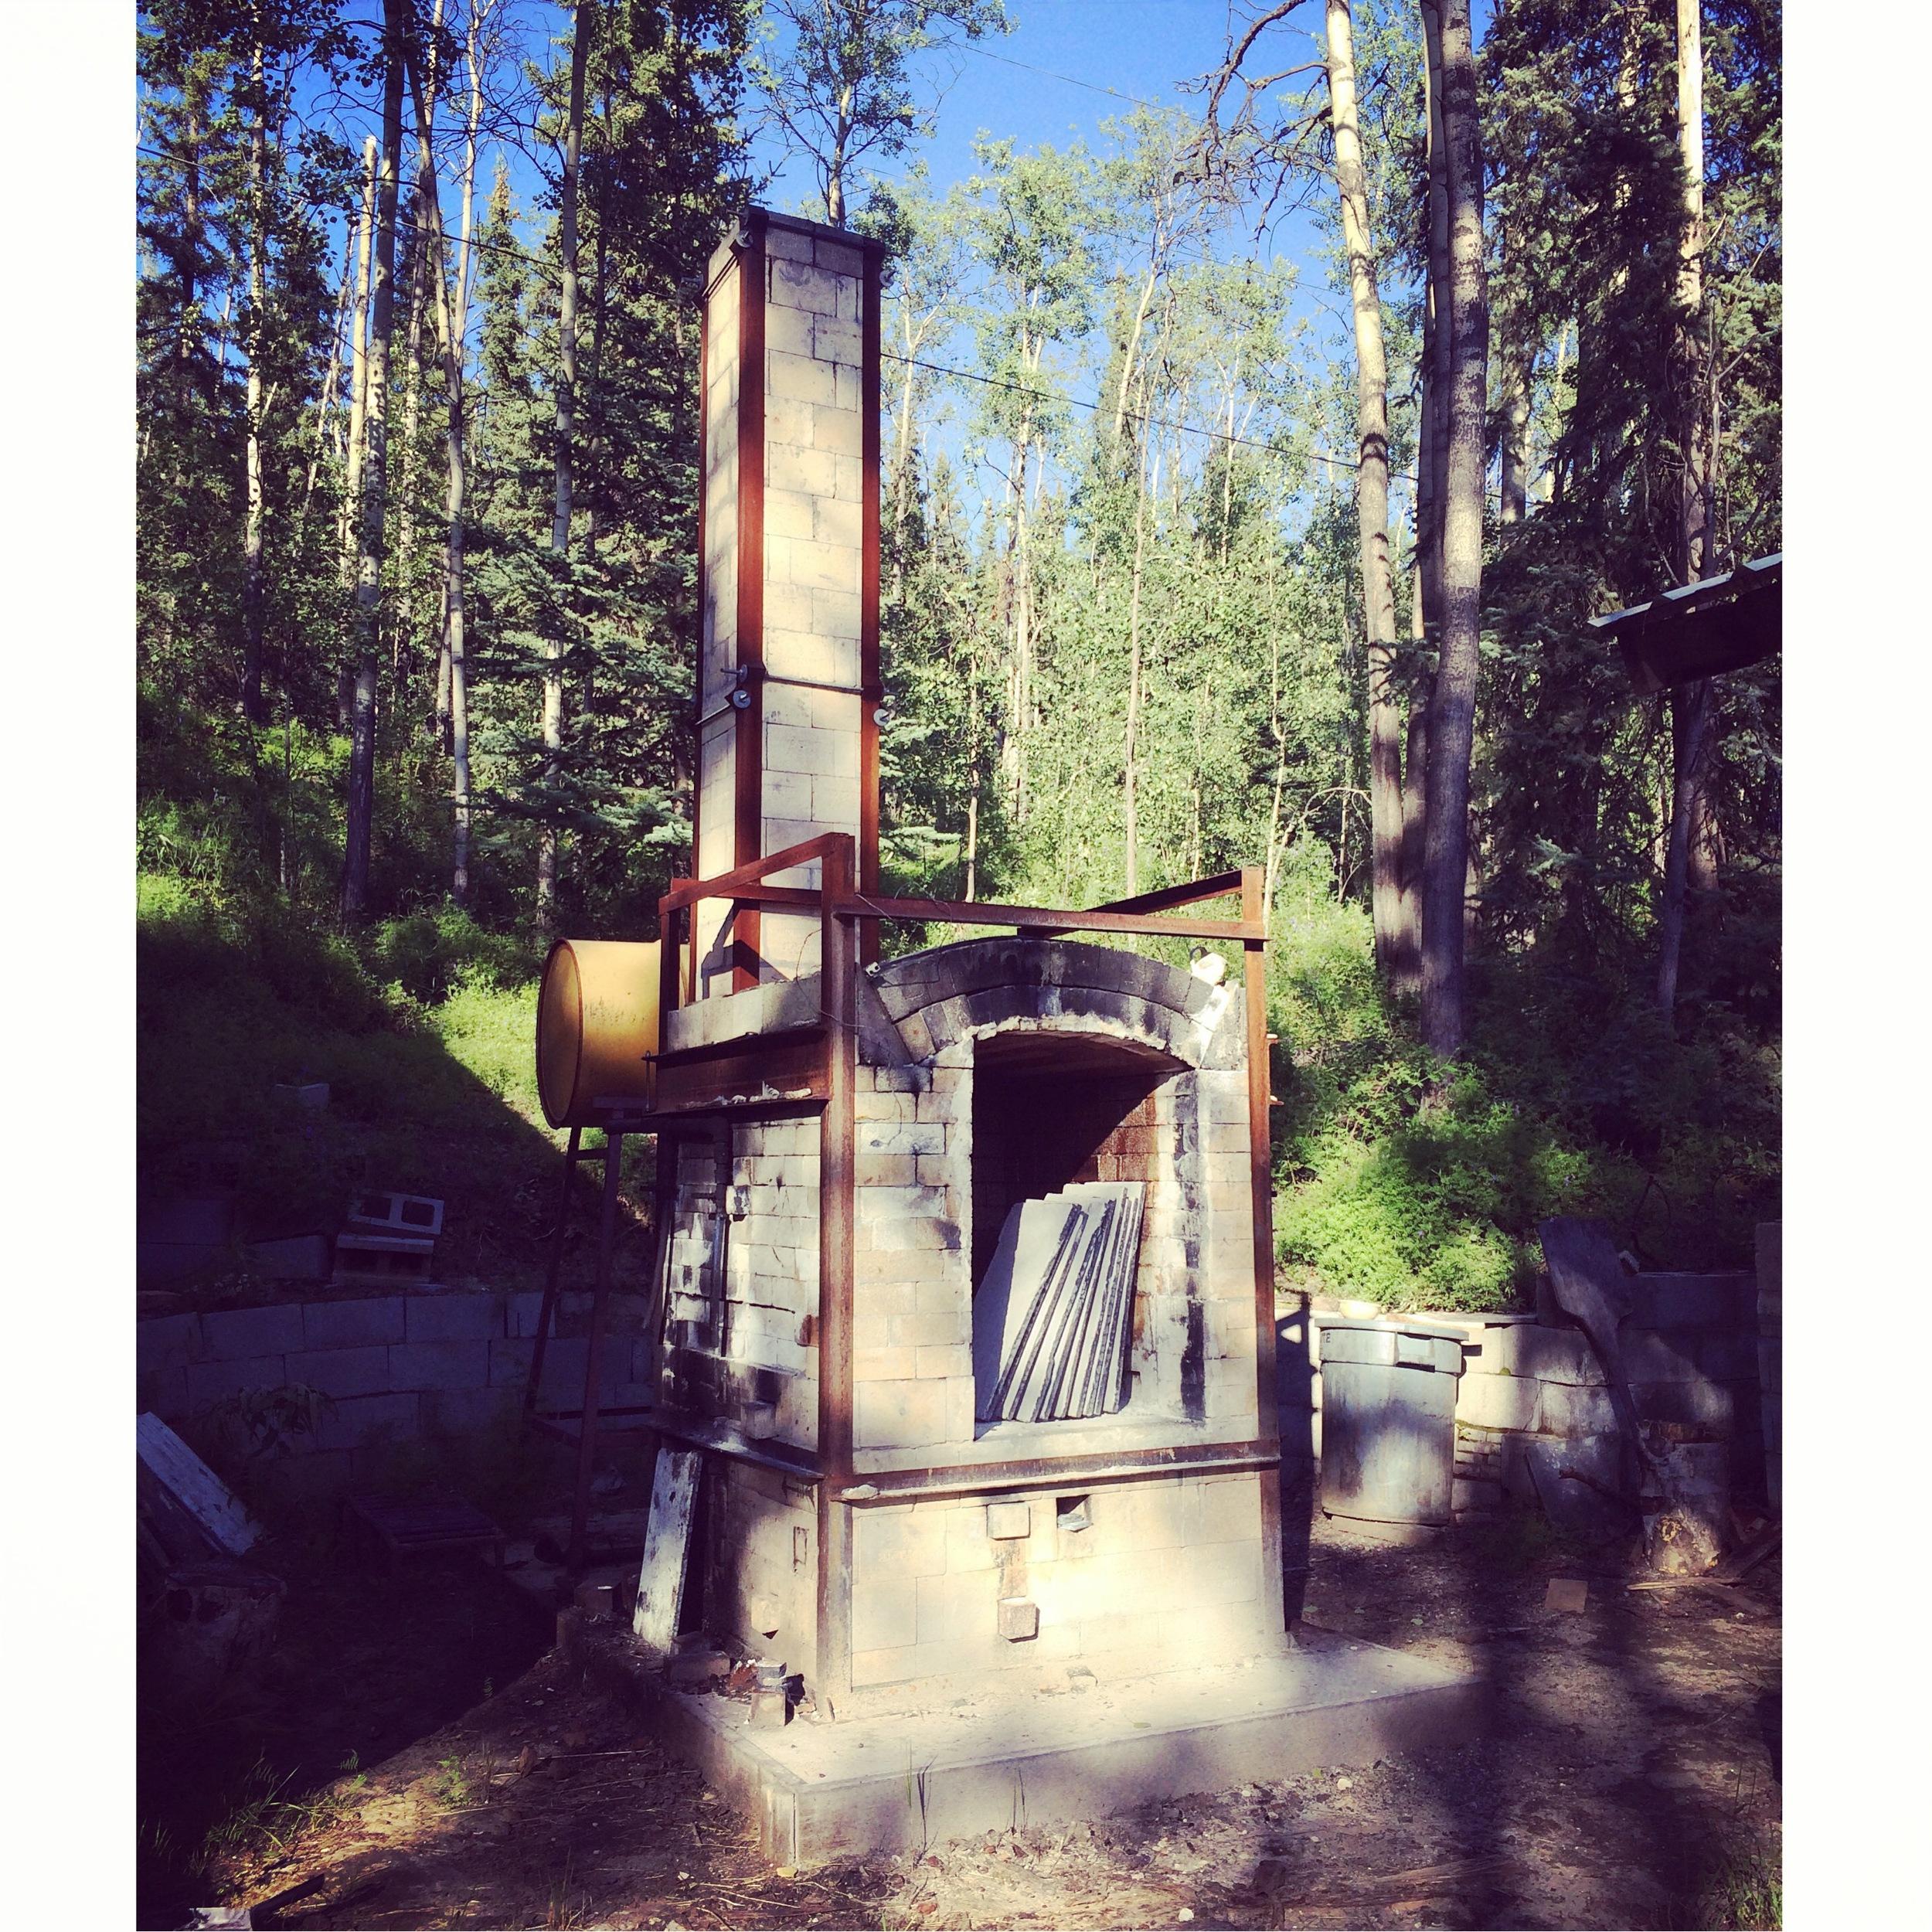 The UAF Waste oil/Soda Kiln!